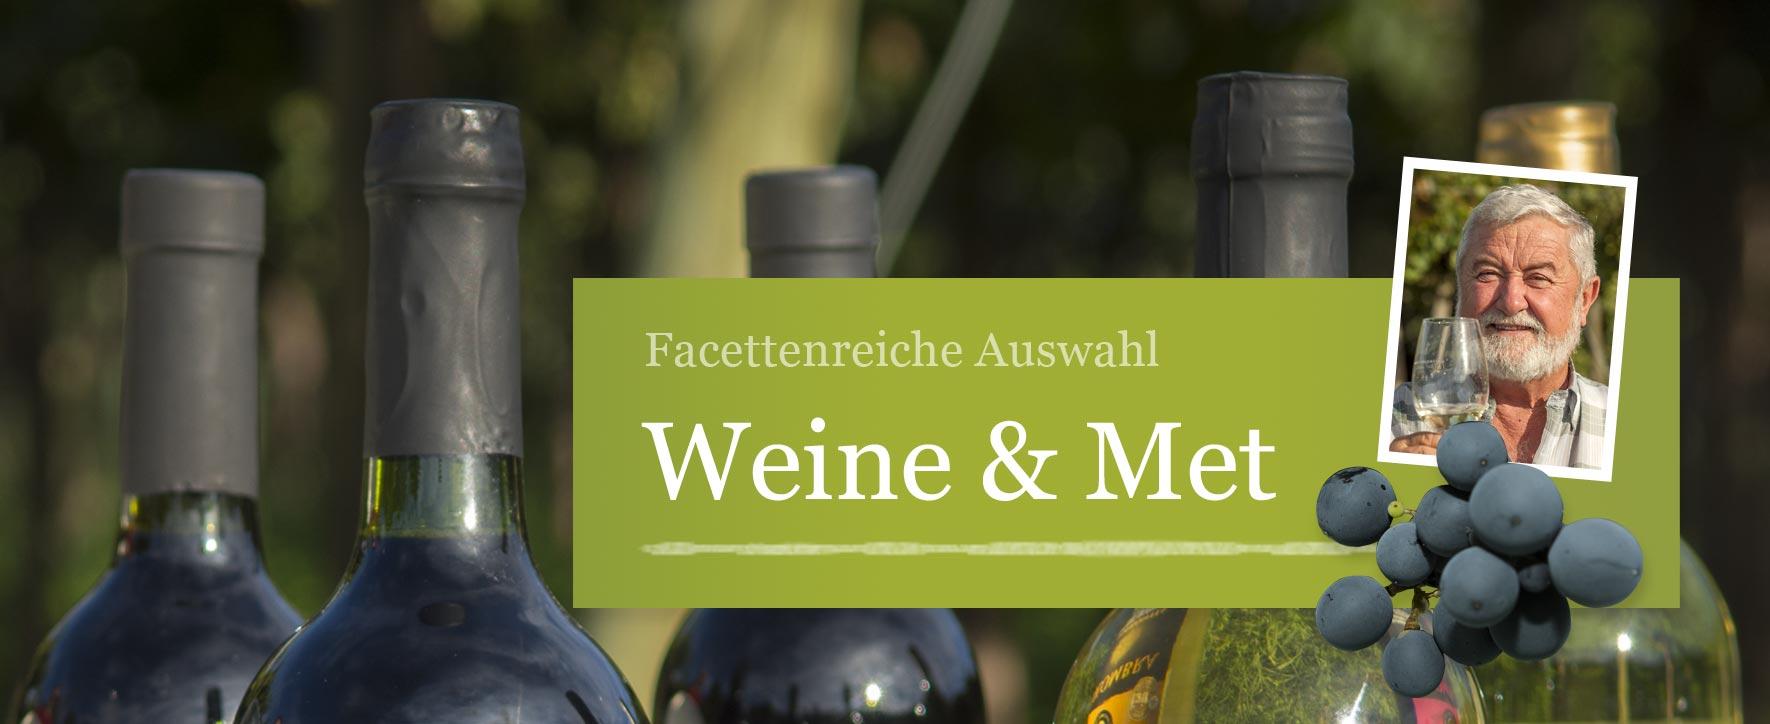 Weine & Met - Foto: GEPA - The Fair Trade Company / C. Nusch